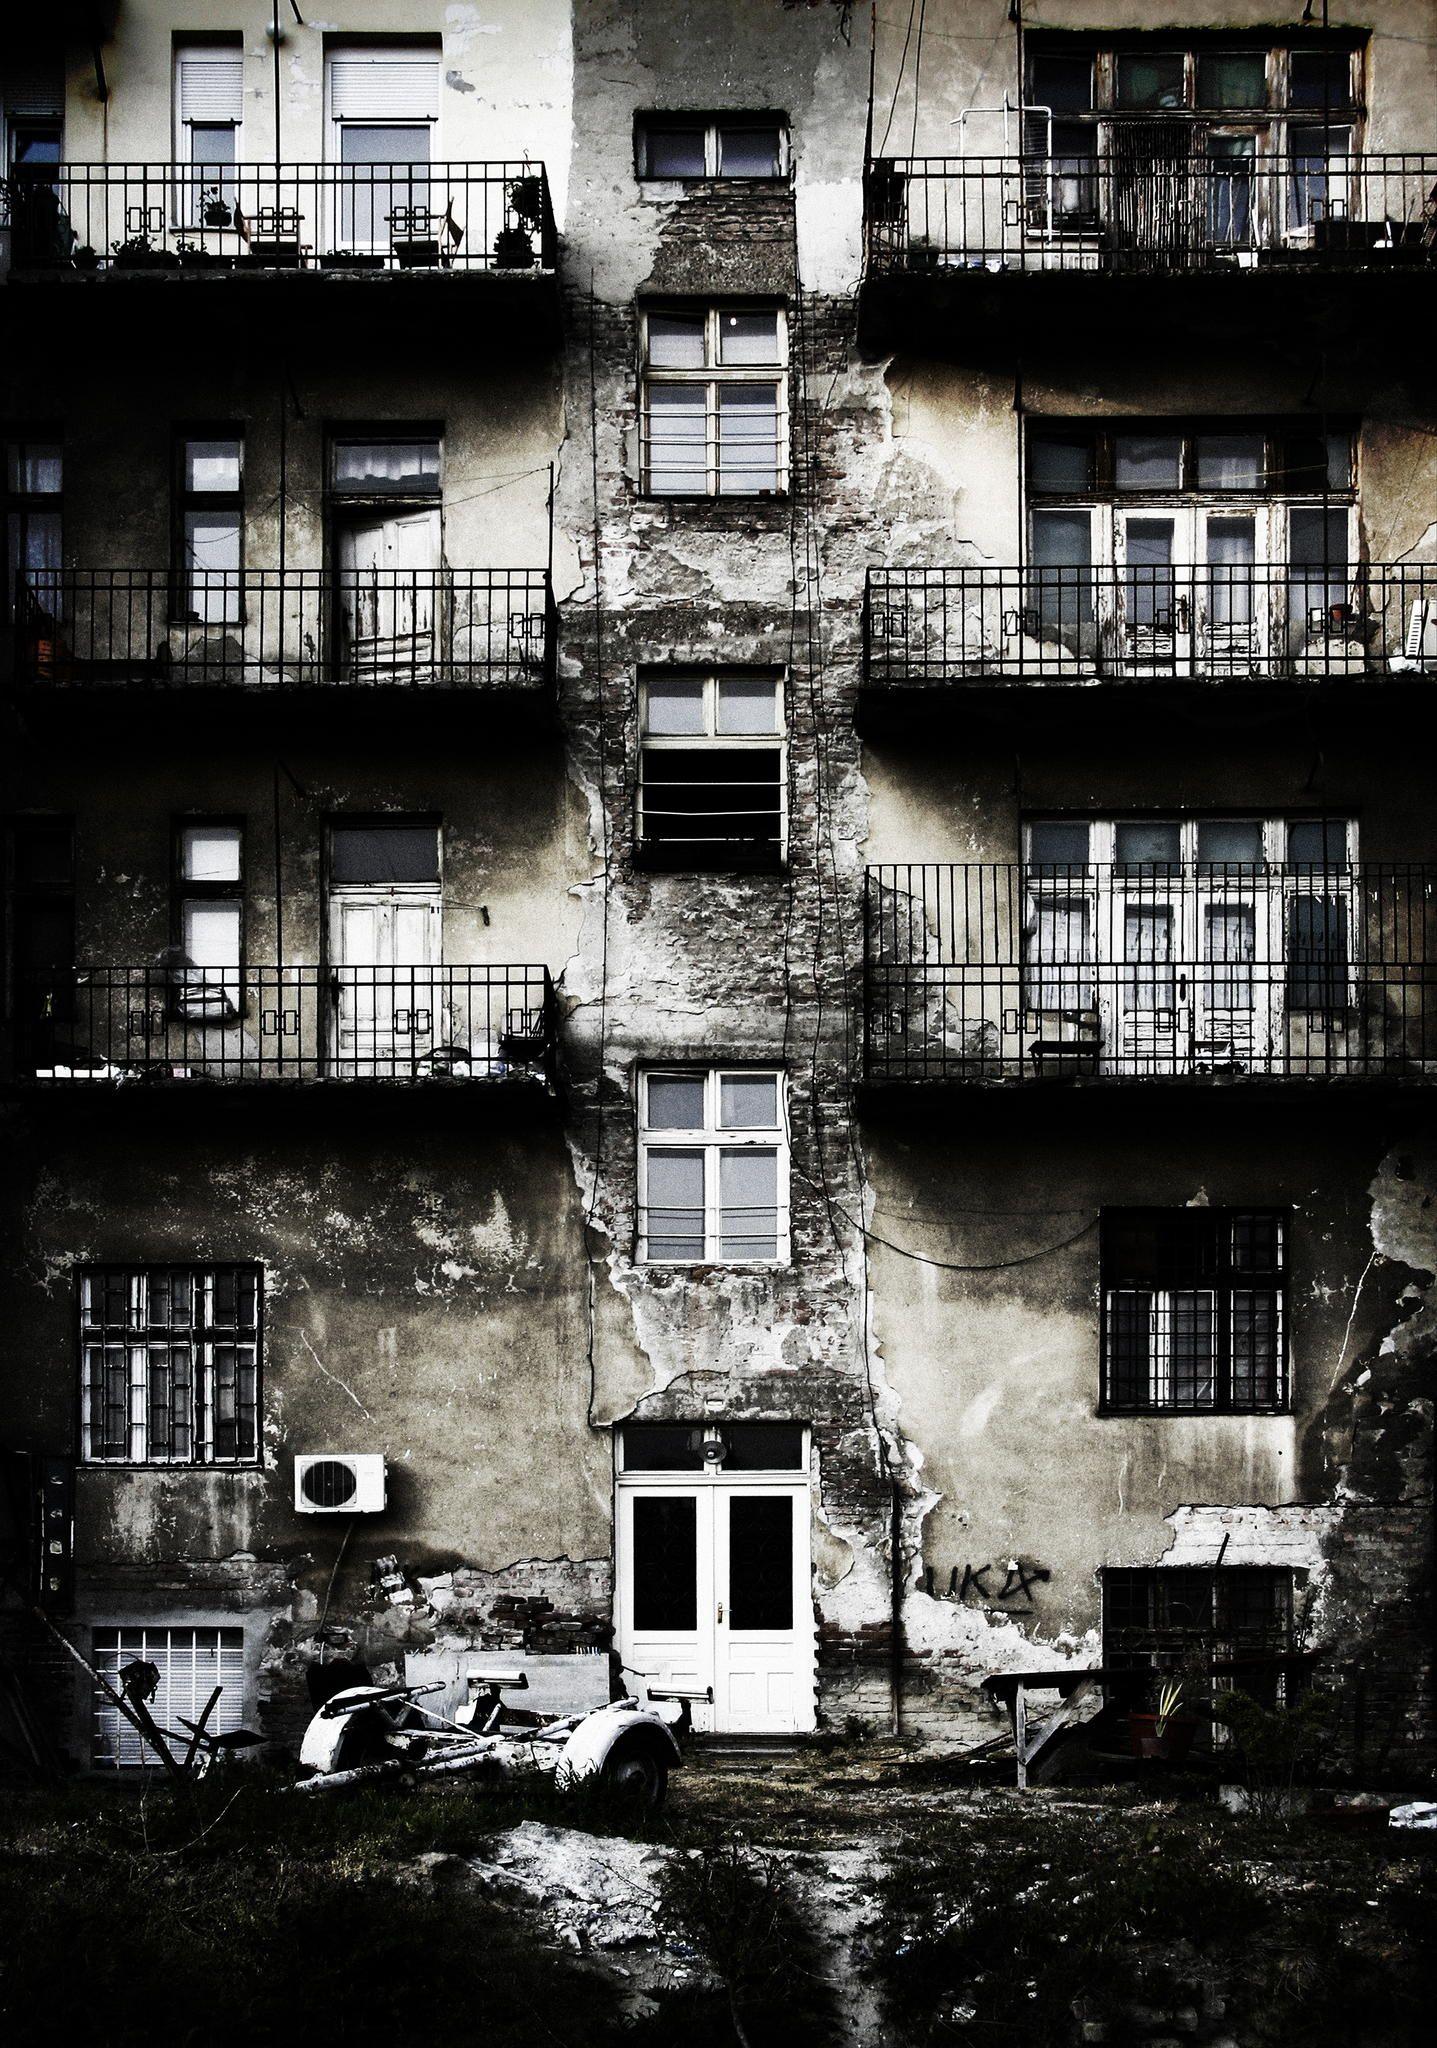 Ruined Building In Belgrade Serbia Beograd Belgrade Architecture City Cities Art Photography Srbija Serbi Belgrade Serbia Architecture Poster Serbia